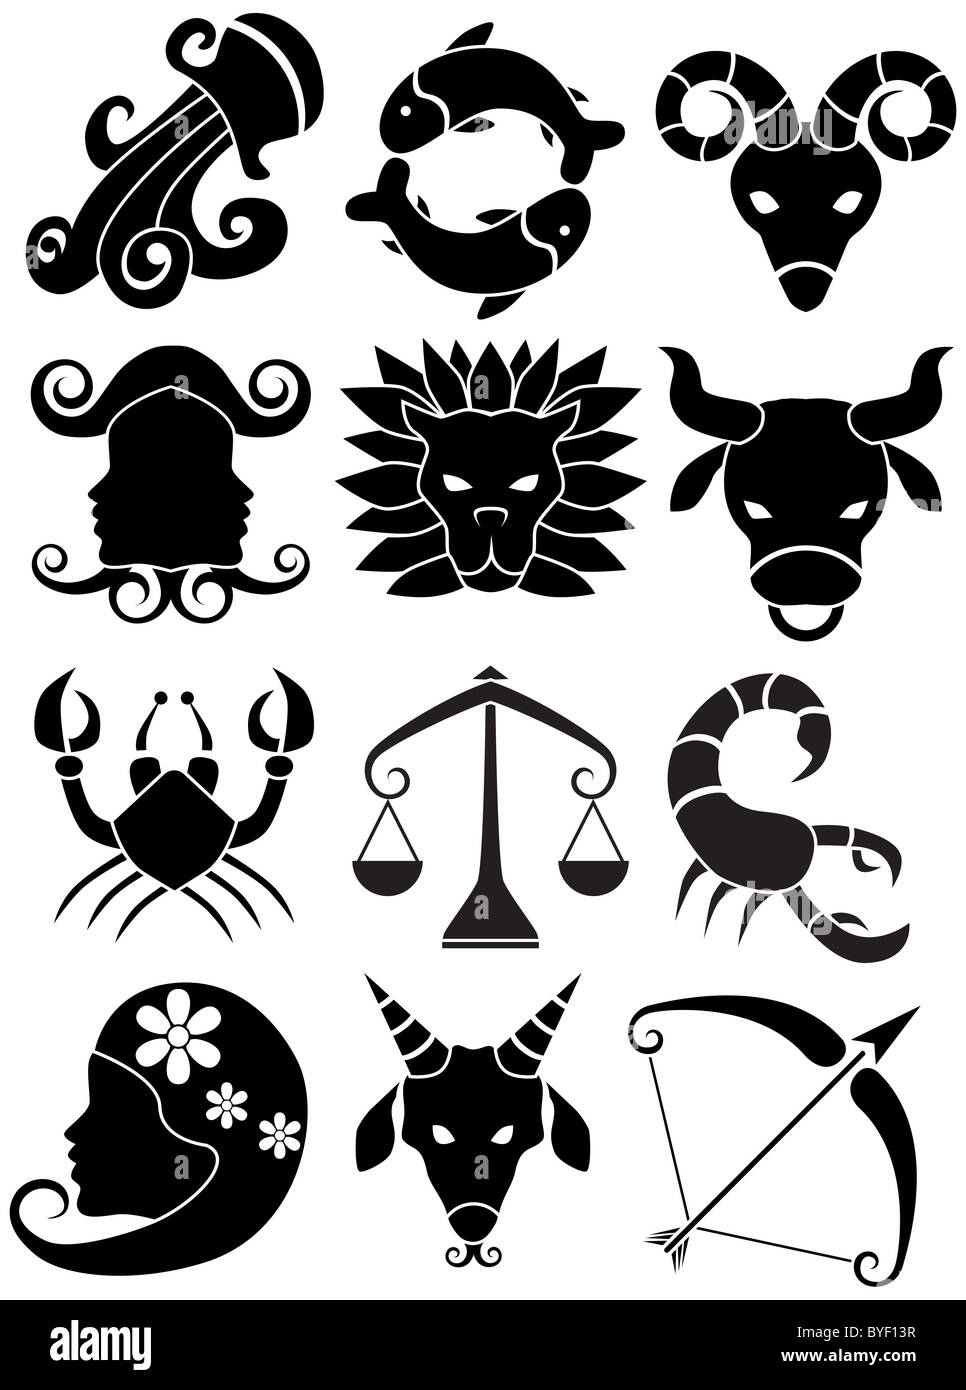 An image of the 12 zodiac symbols. Stock Photo